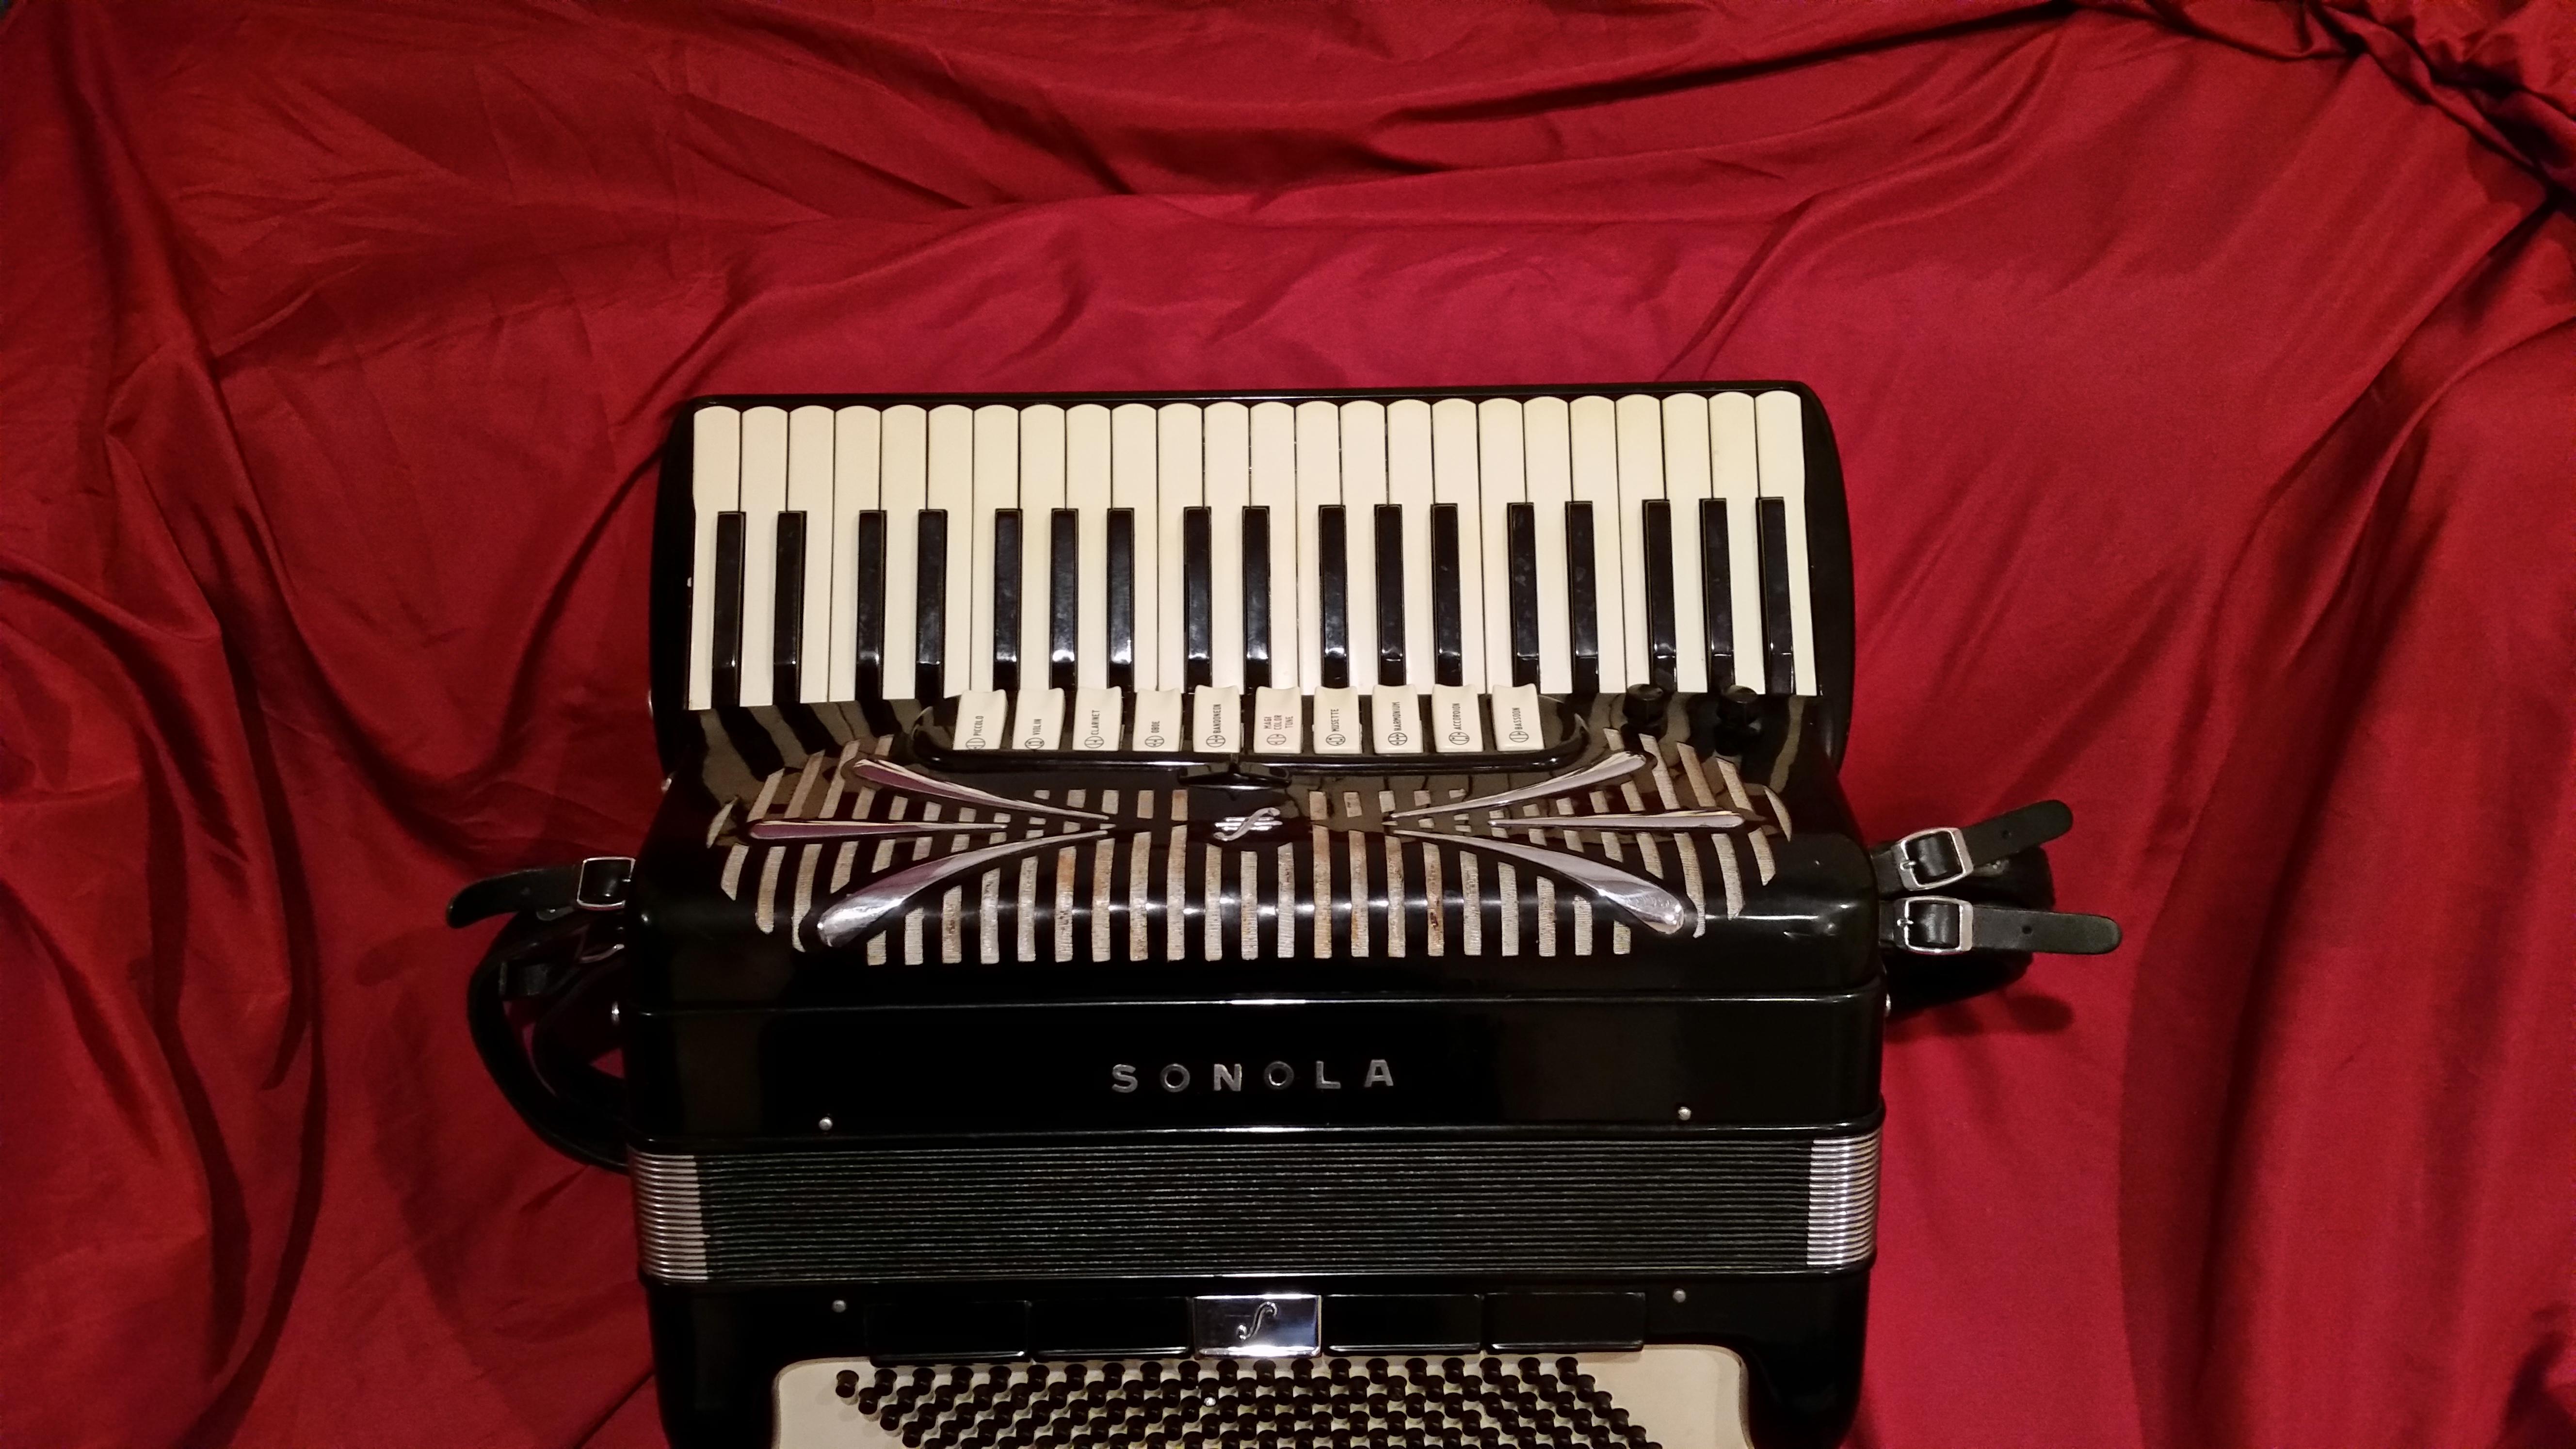 Sonola A 20 professional grade accordion..jpg